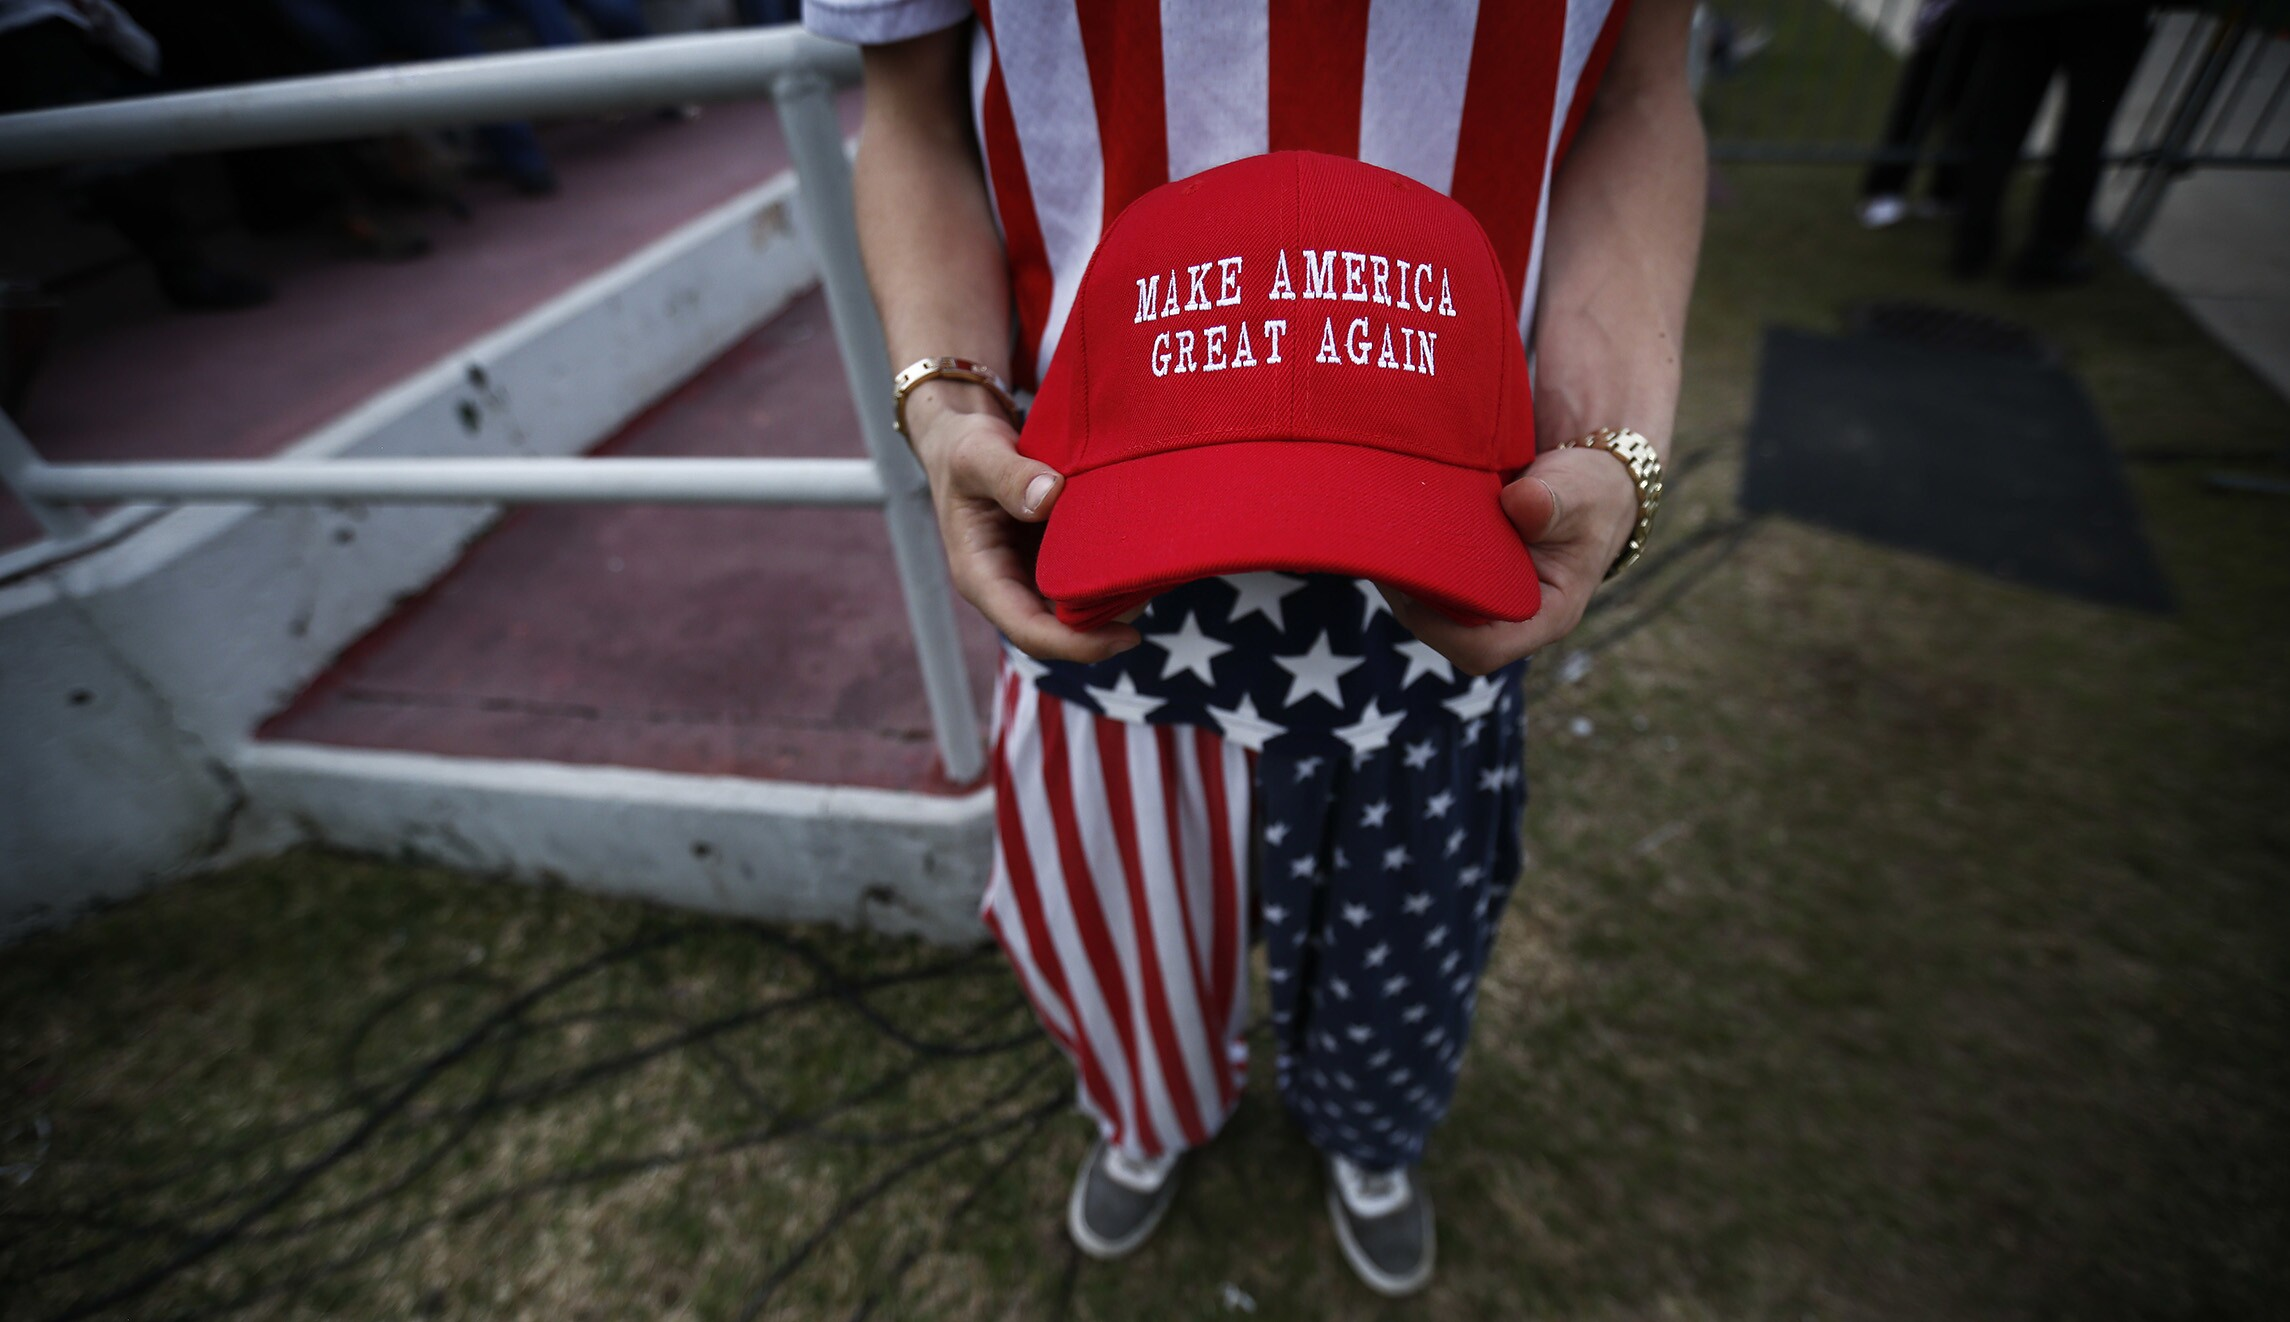 b68cf8a3 The secret to making America great again